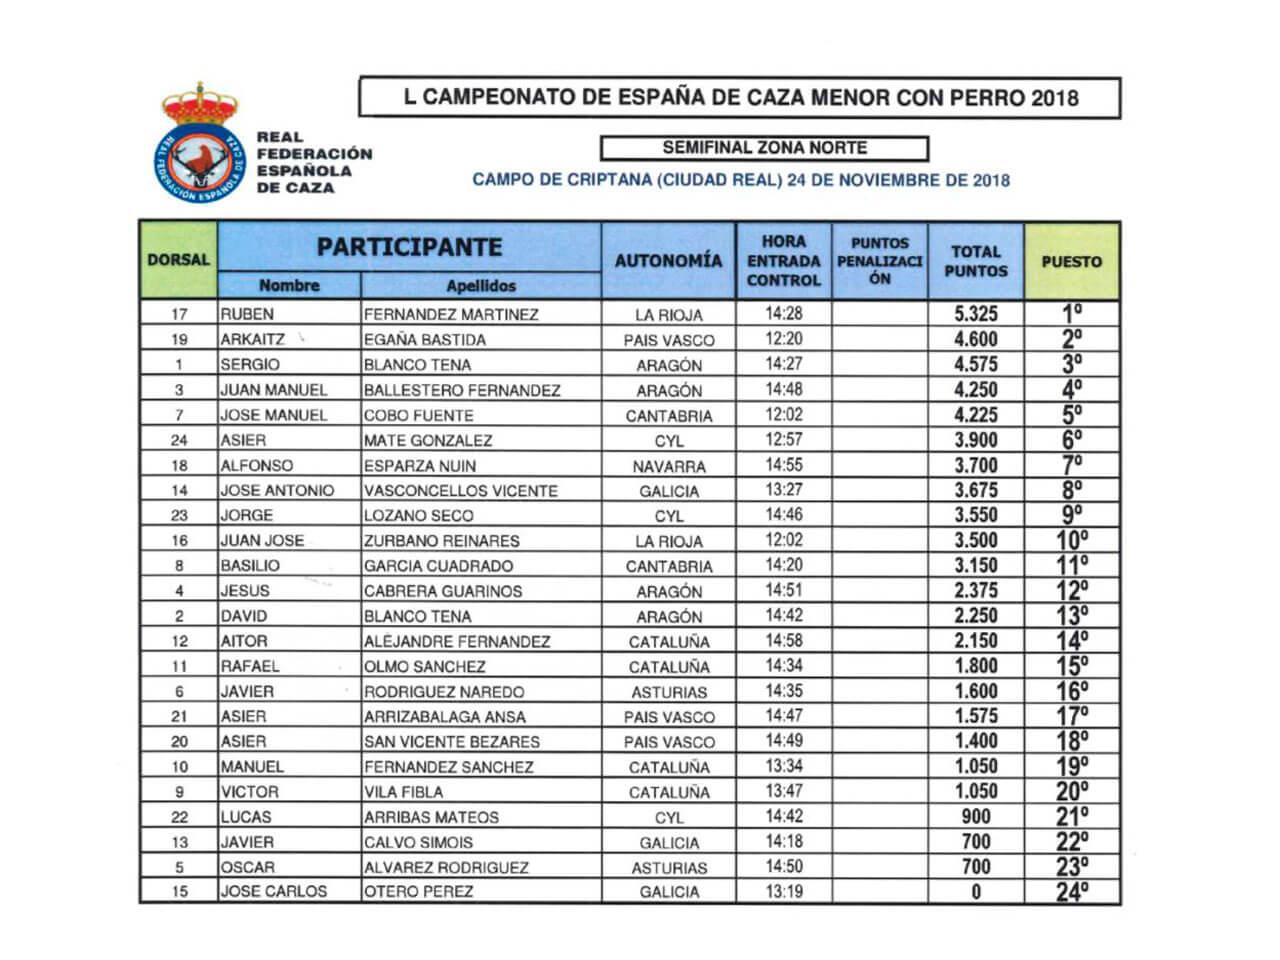 Clasificaciones Campeonato España Caza menor con perro